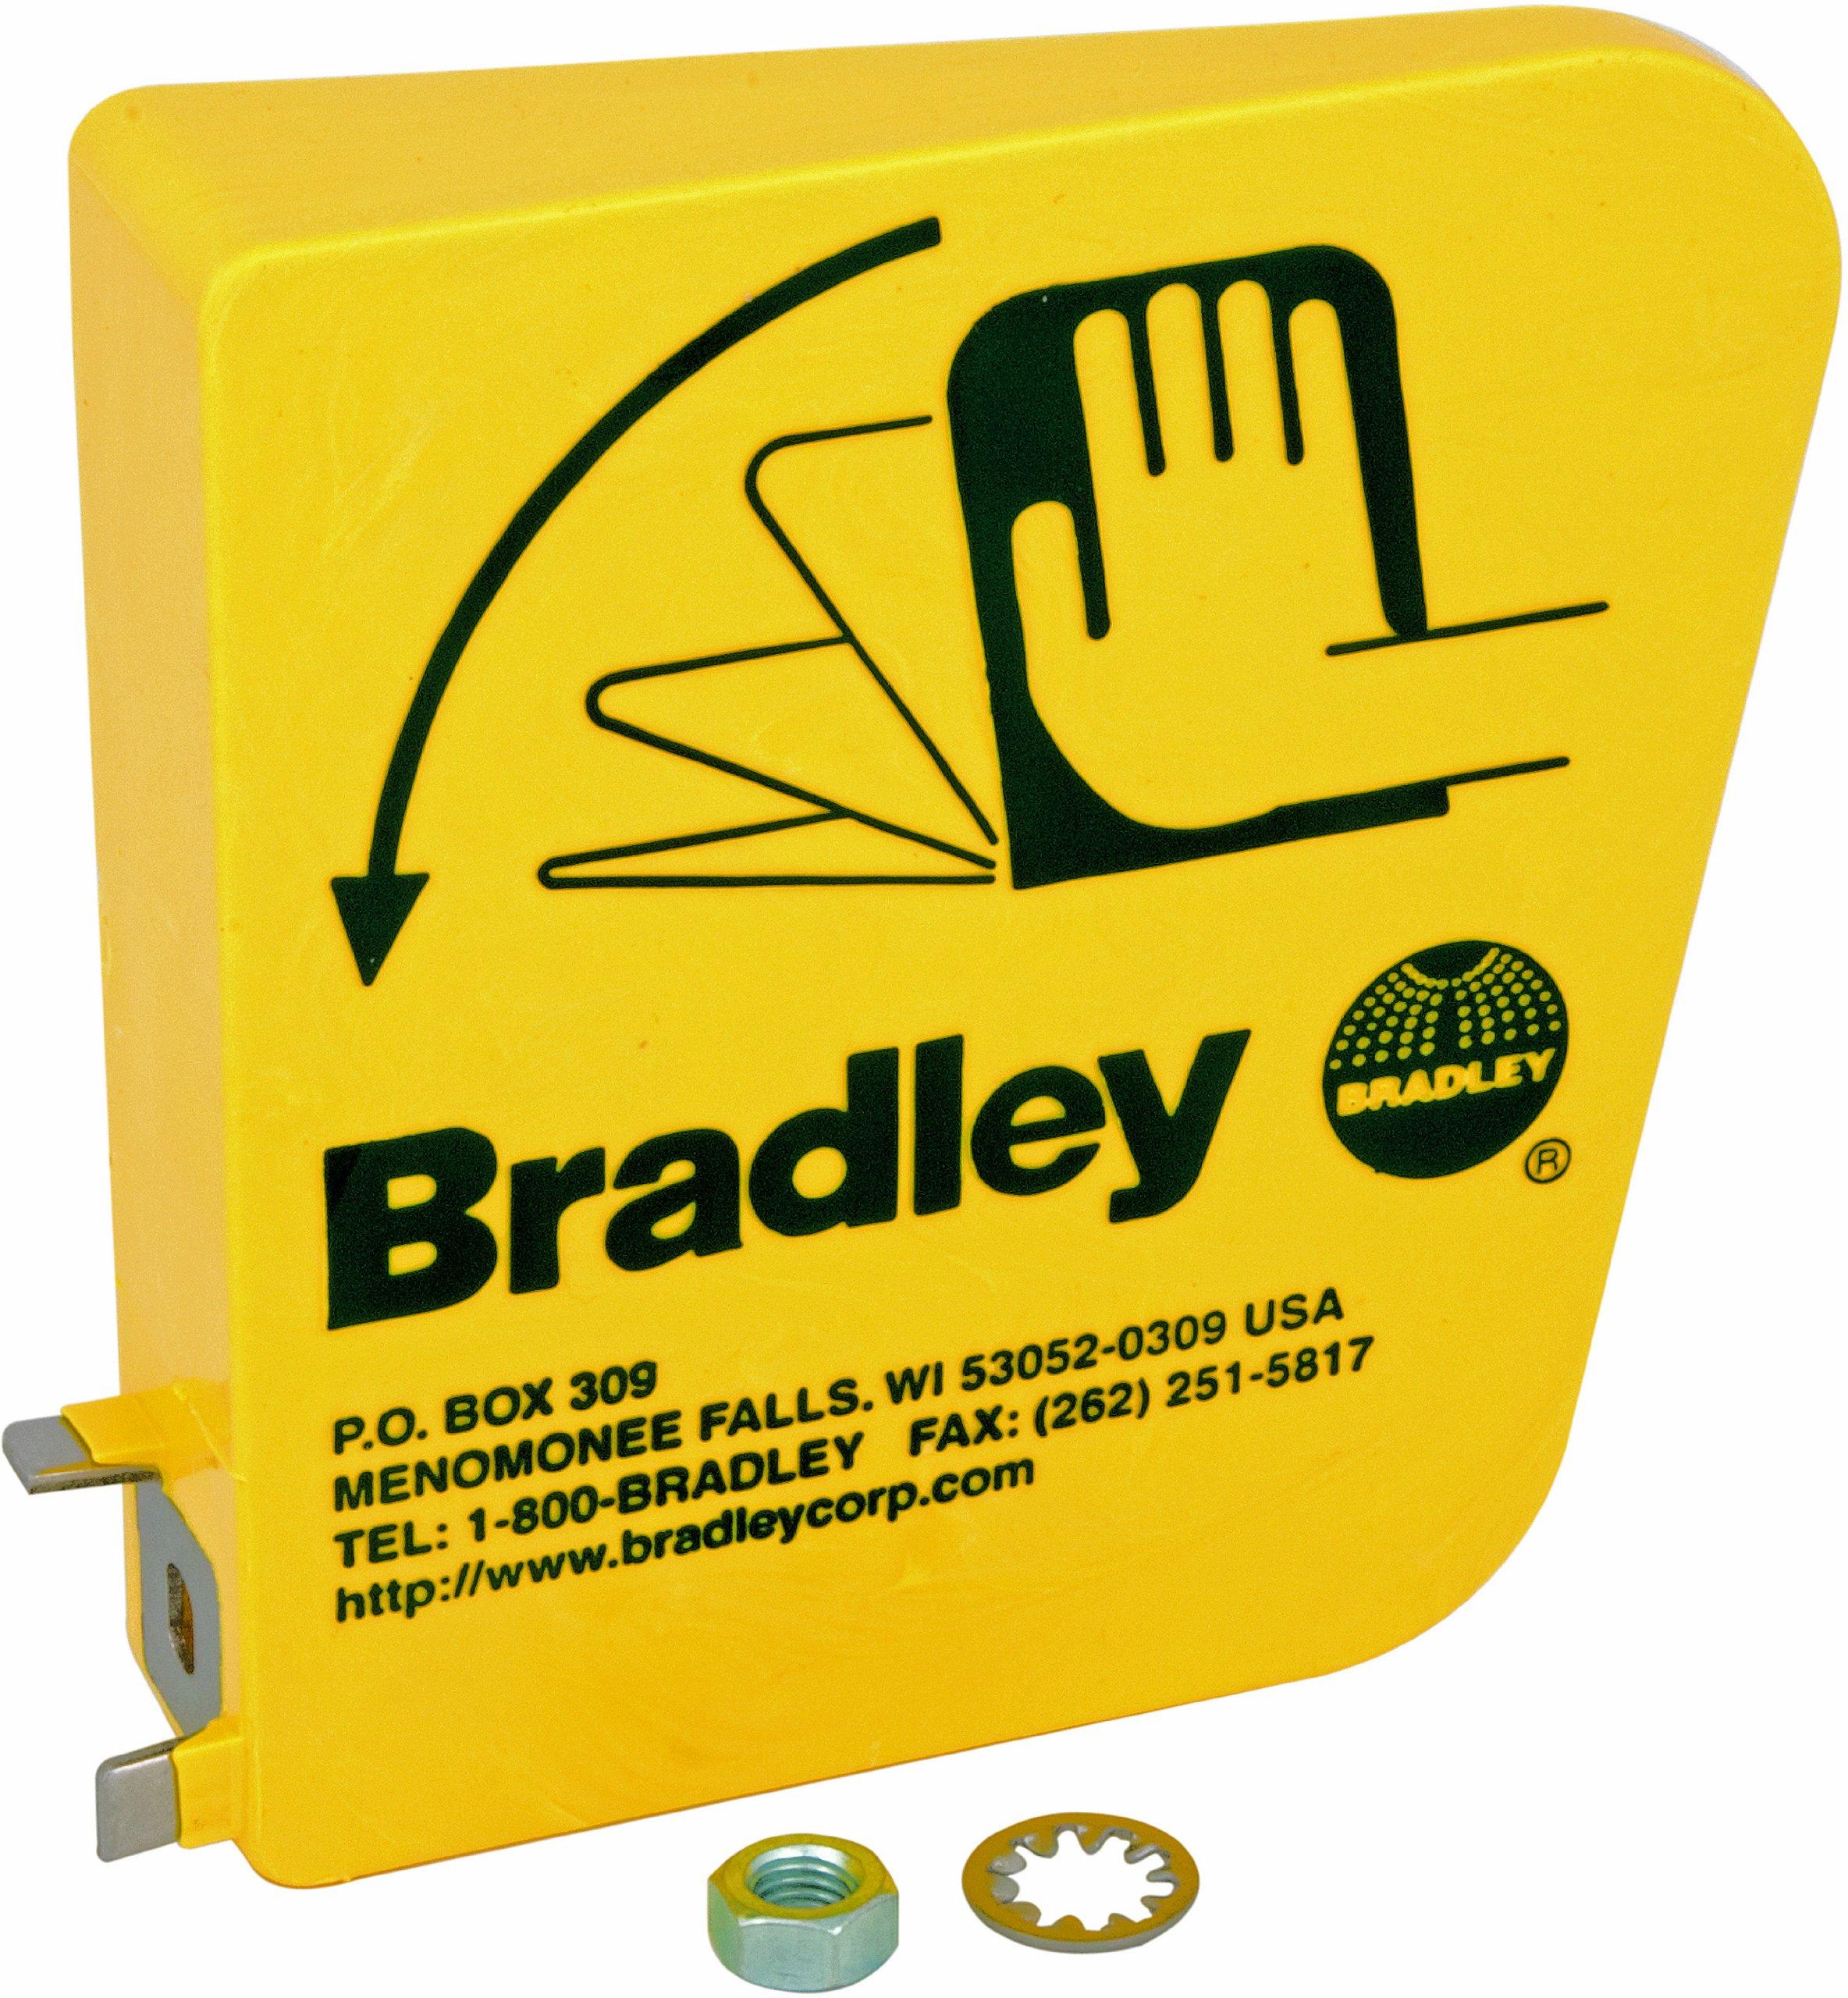 Bradley S45-123 Eyewash Plastic Handle by Bradley